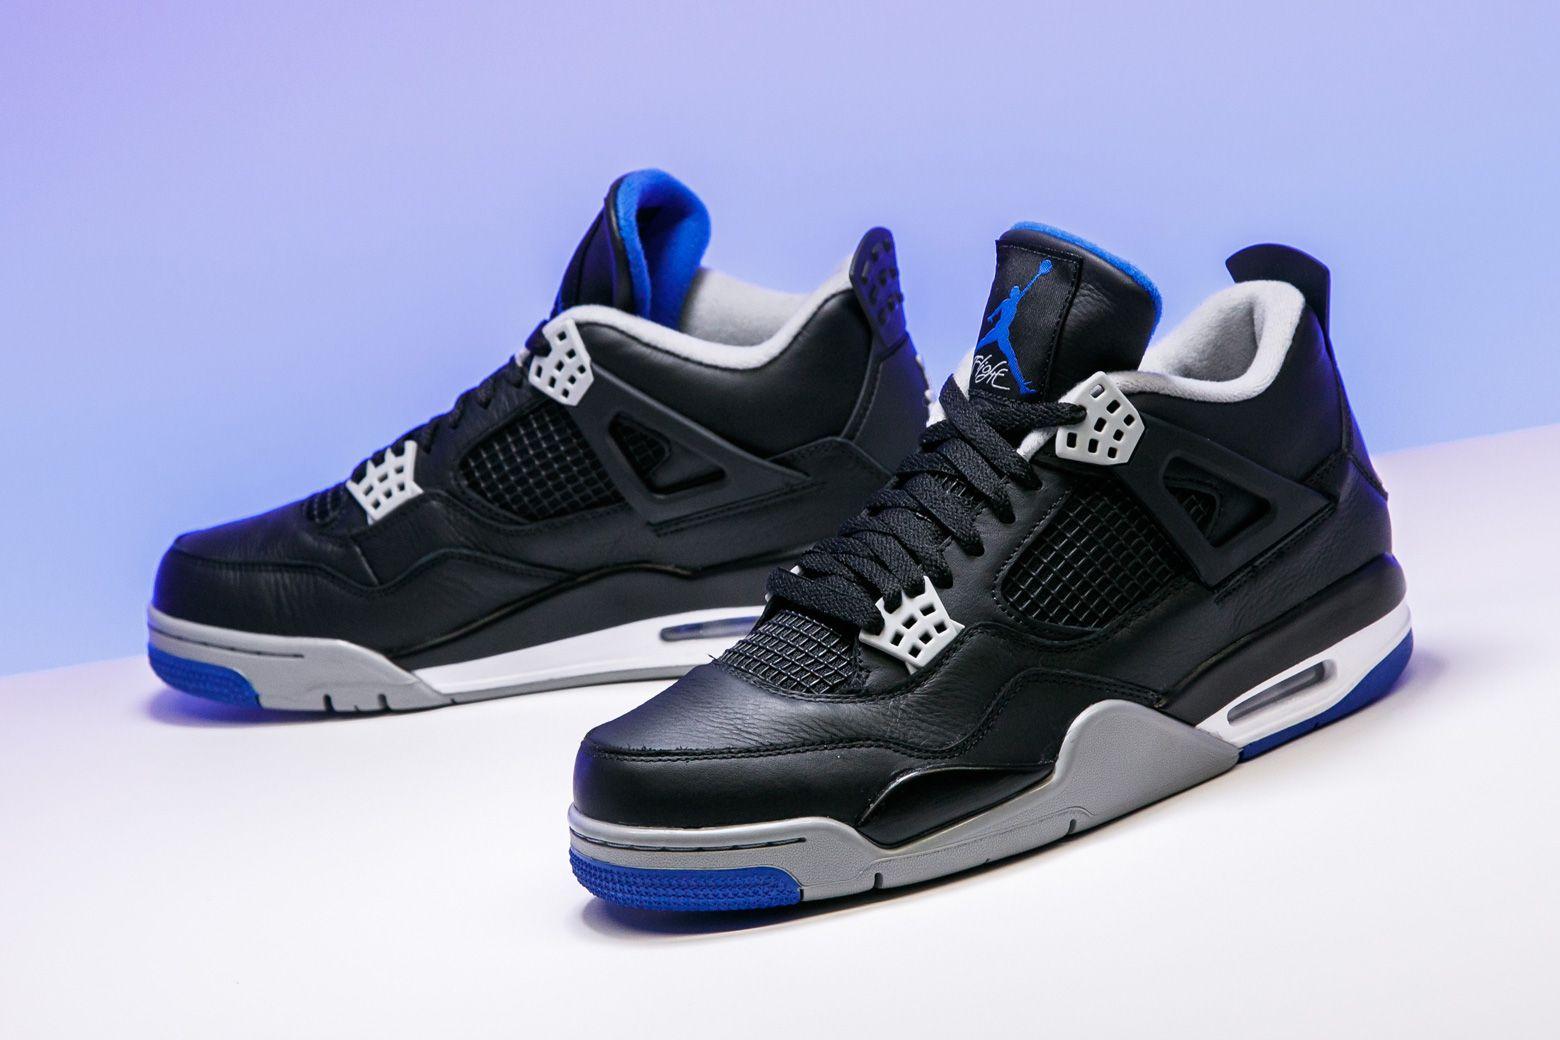 best sneakers 55f1b 29de2 Today, the early bird gets the Air Jordan 4 Retro